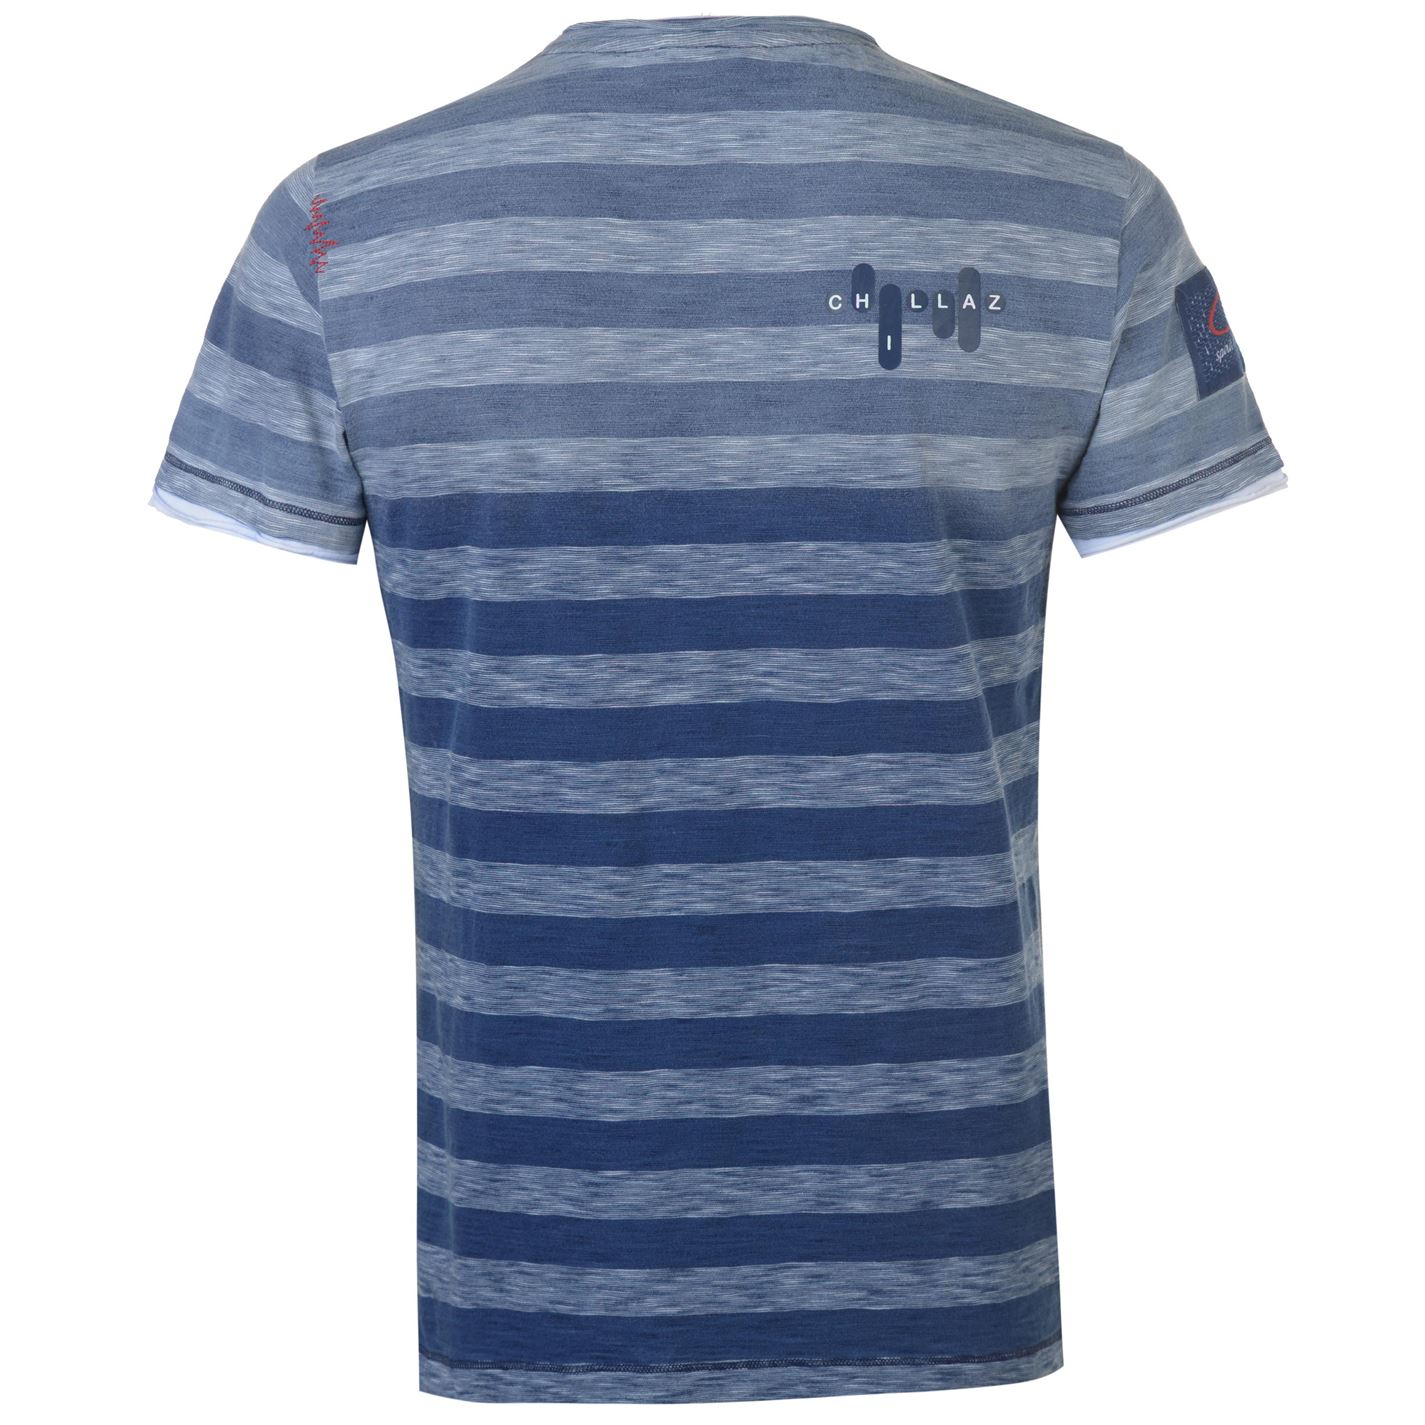 Chillaz Circled T Shirt Mens Gents Short Sleeve Performance Tee Top Crew Neck